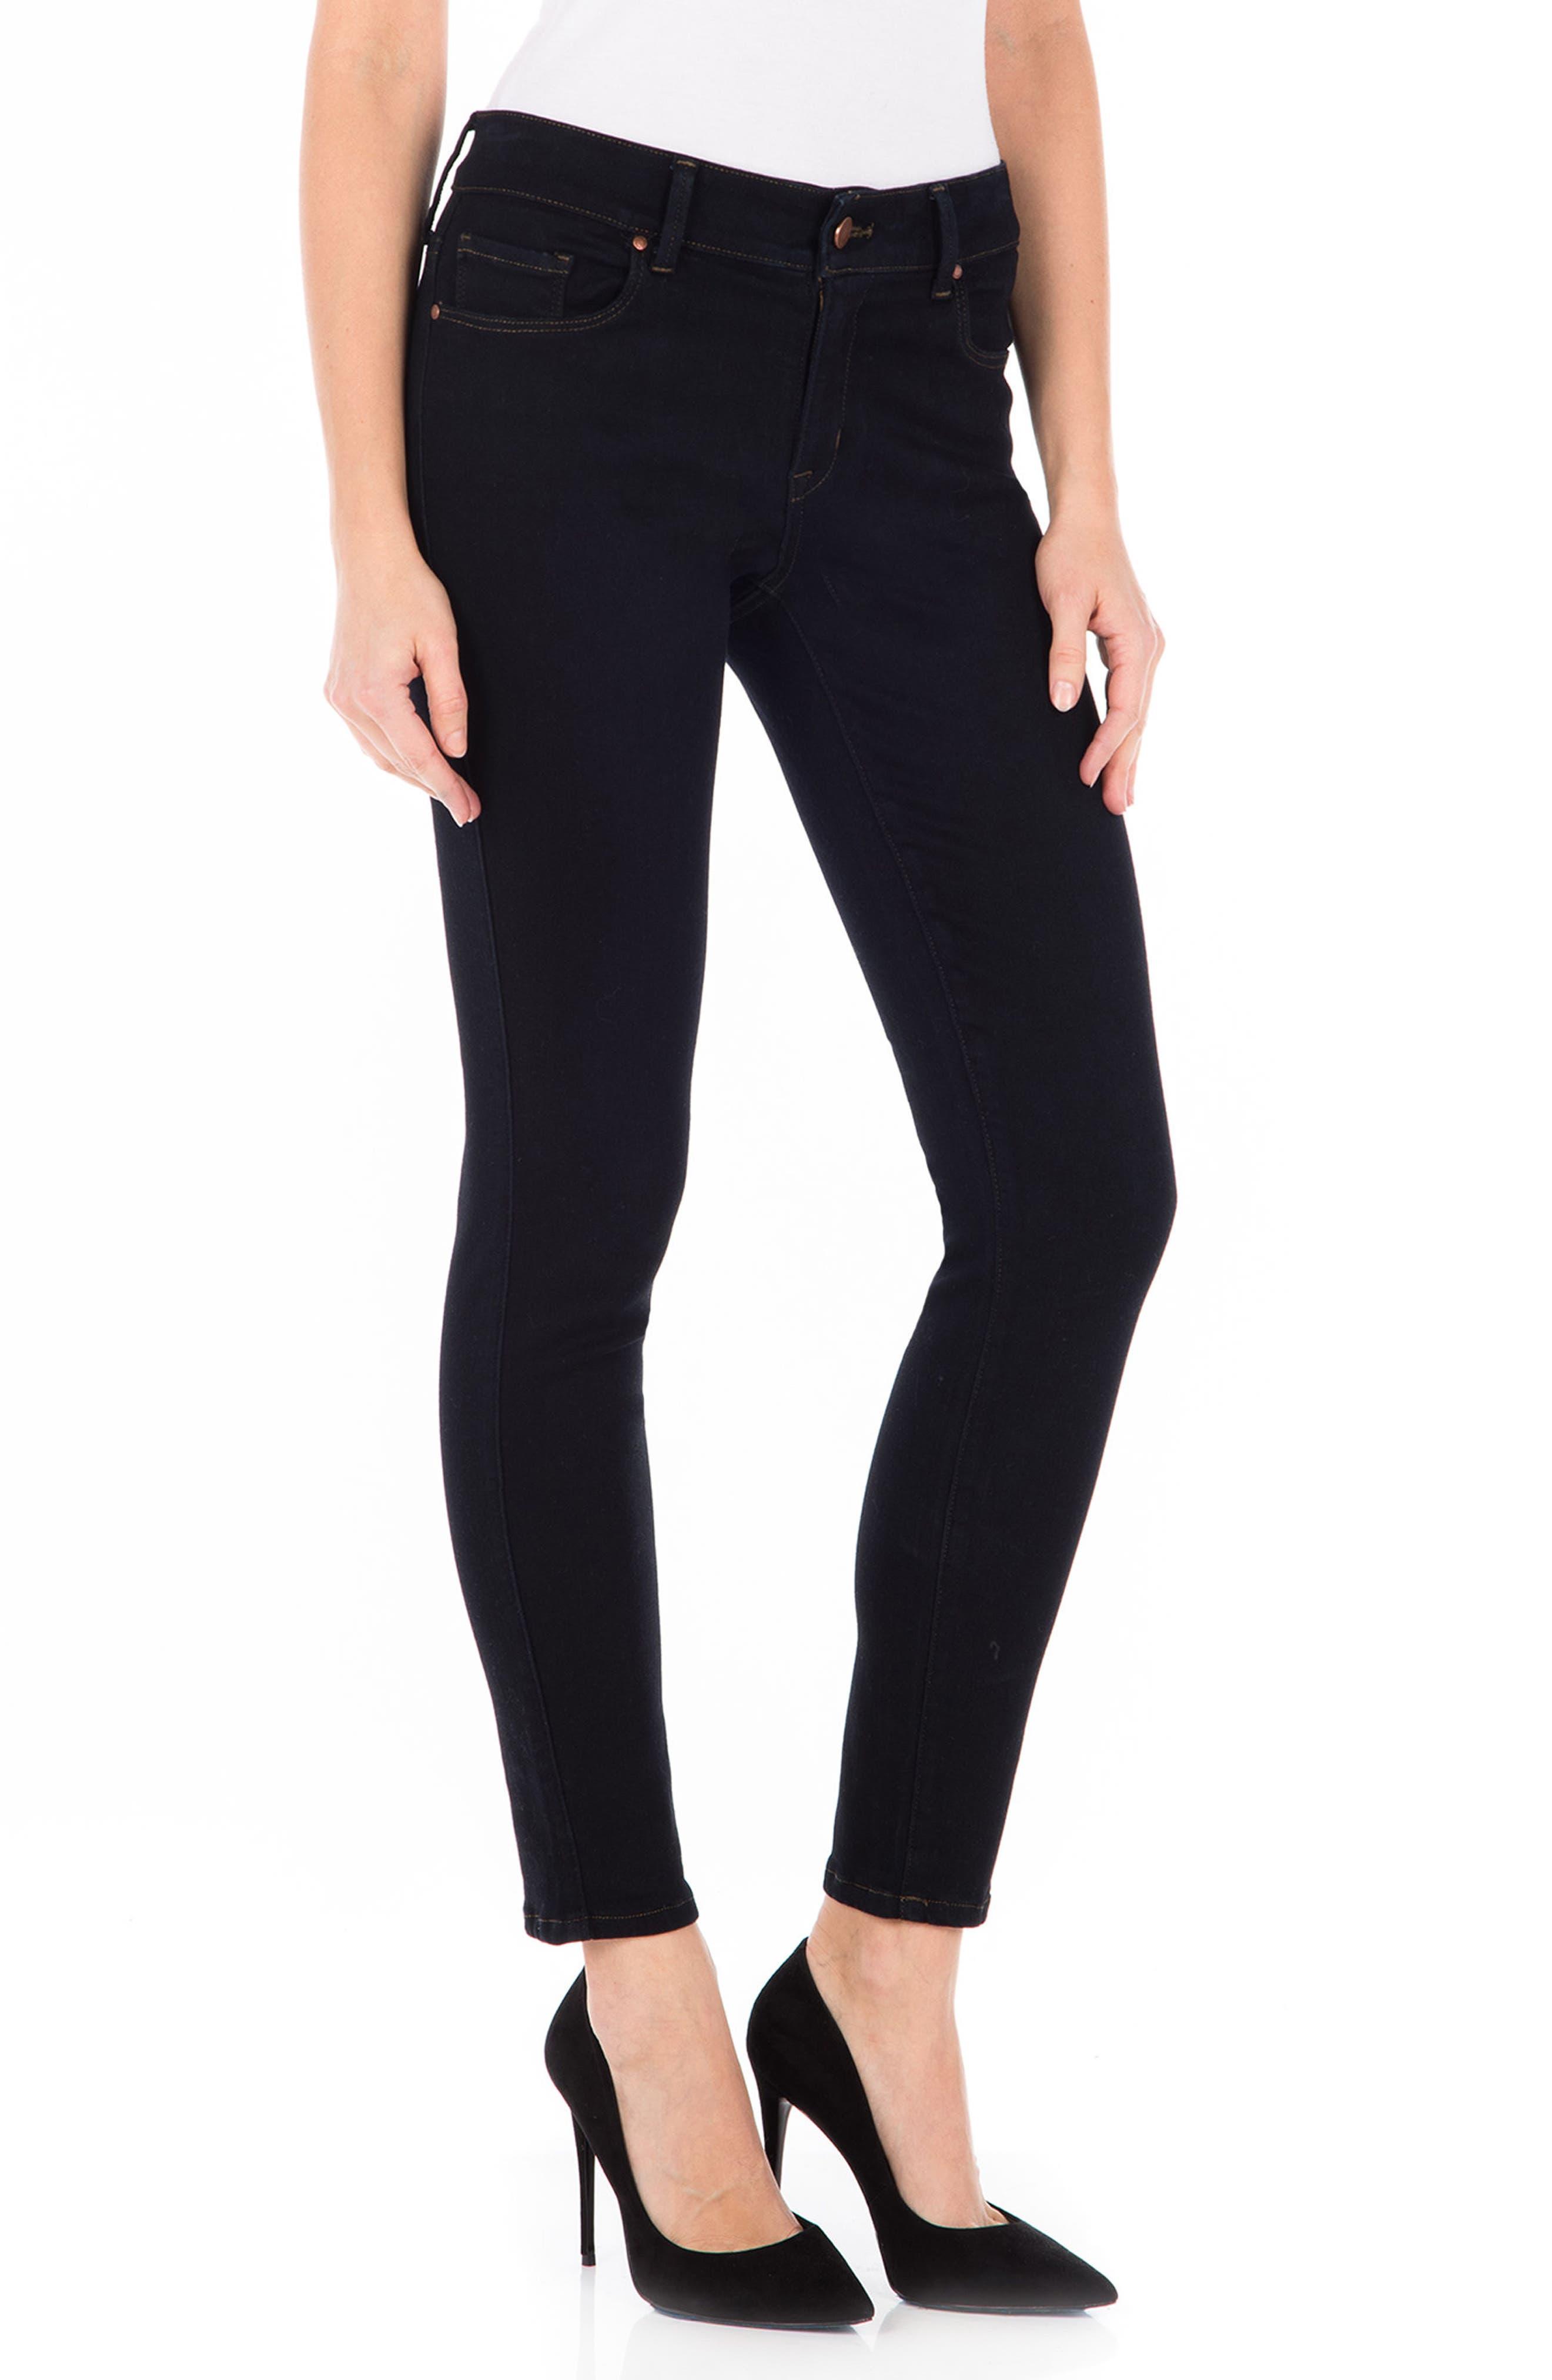 Sola Skinny Jeans,                             Alternate thumbnail 3, color,                             Navy Noir